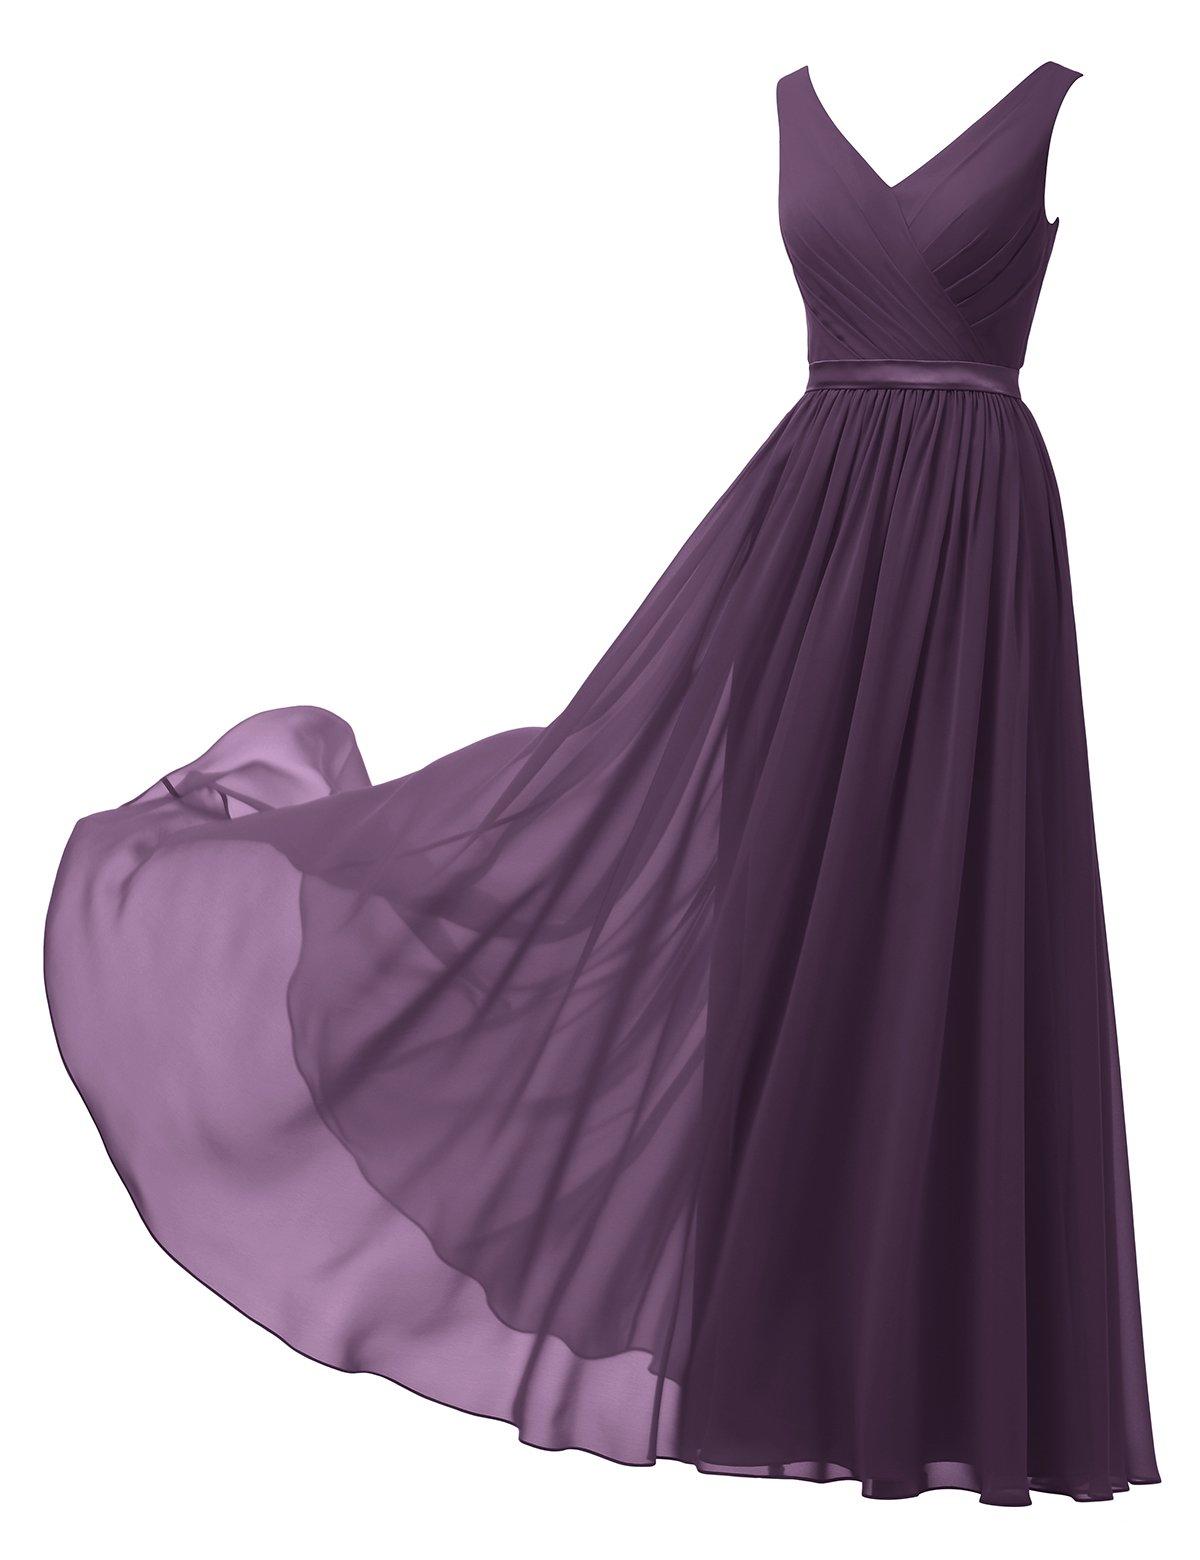 Alicepub V-Neck Chiffon Bridesmaid Dress Long Evening Formal Gown Sleeveless